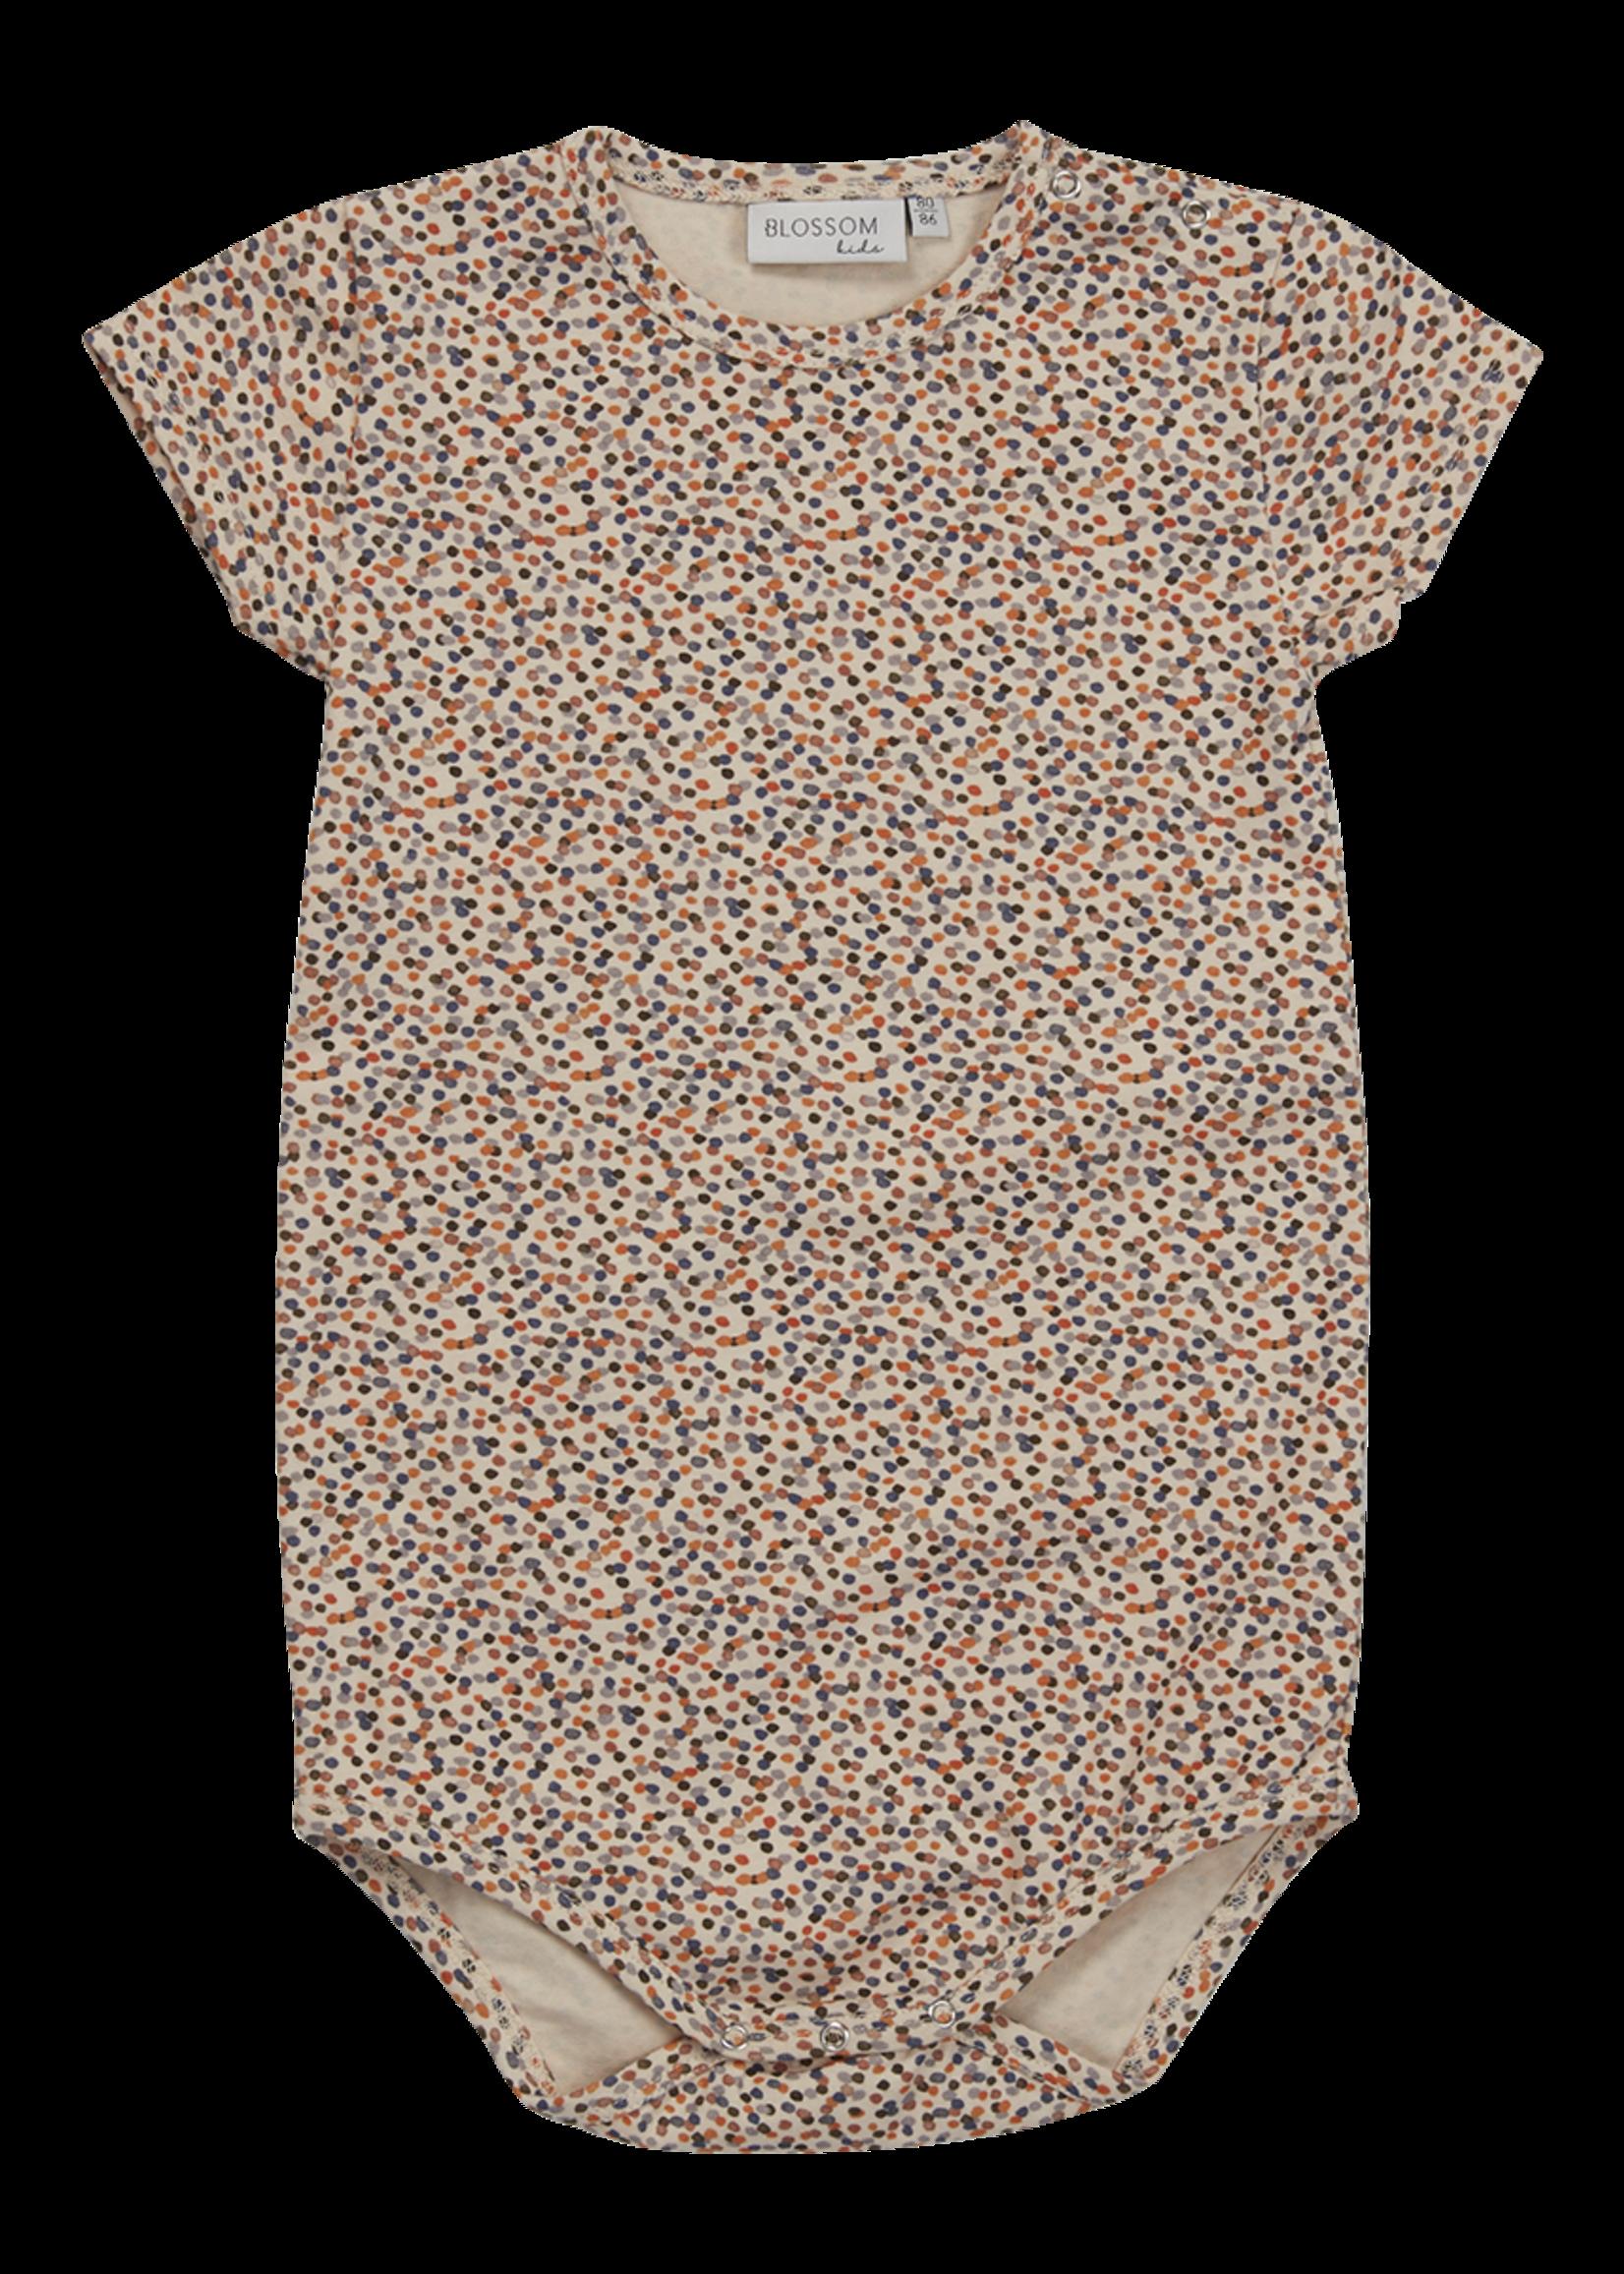 Blossom Kids BK - Body short sleeve - Confetti Blossom